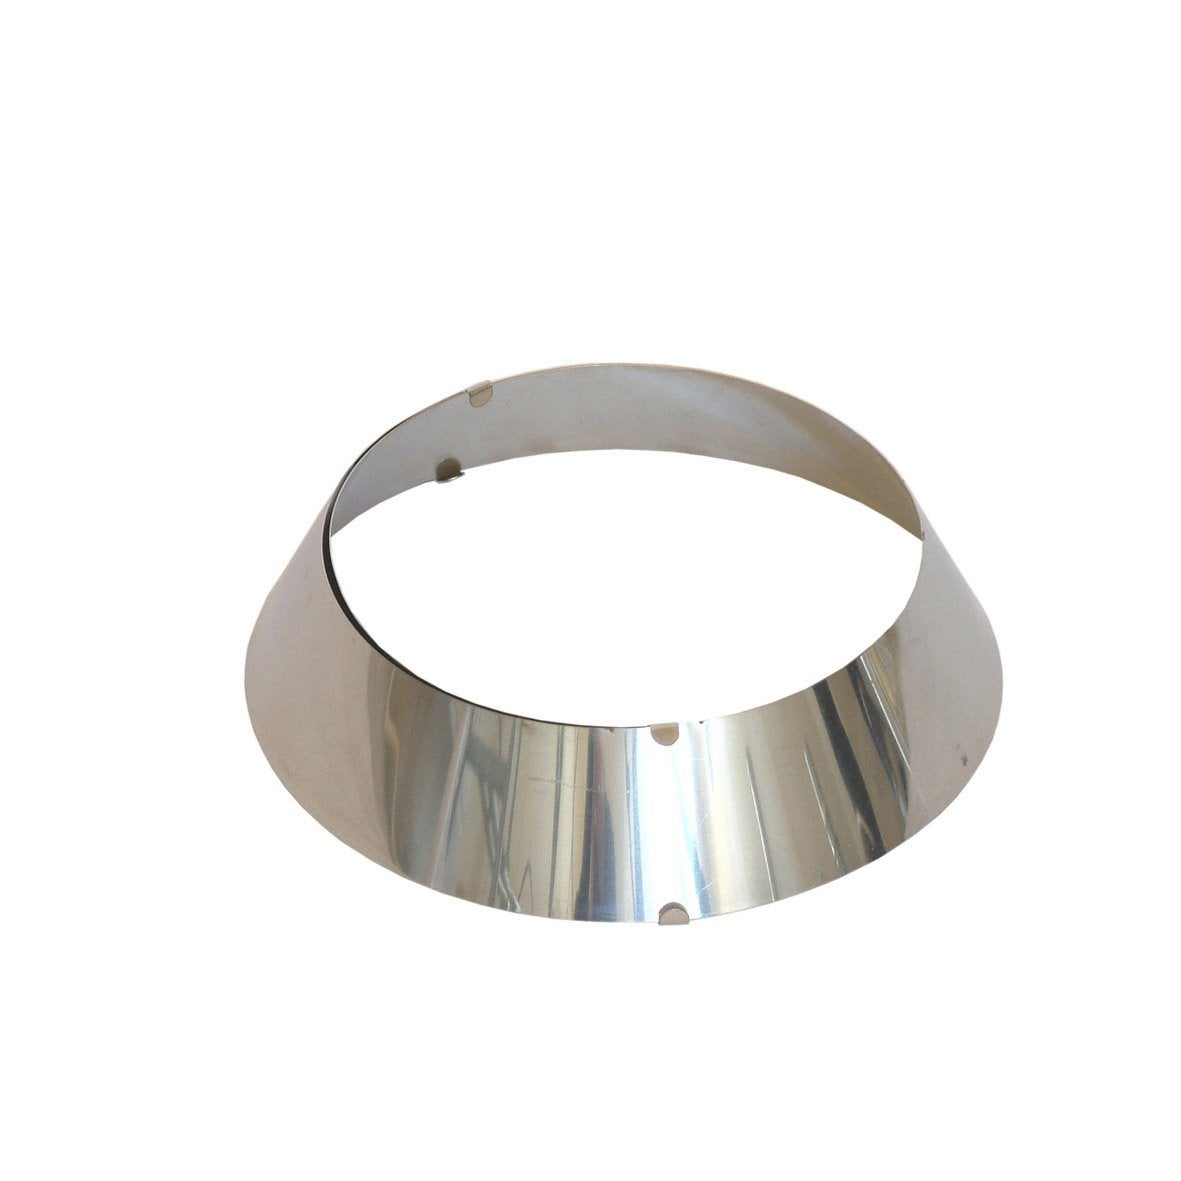 Rosace r glable en inox 153 200 mm leroy merlin for Rosace sol exterieur